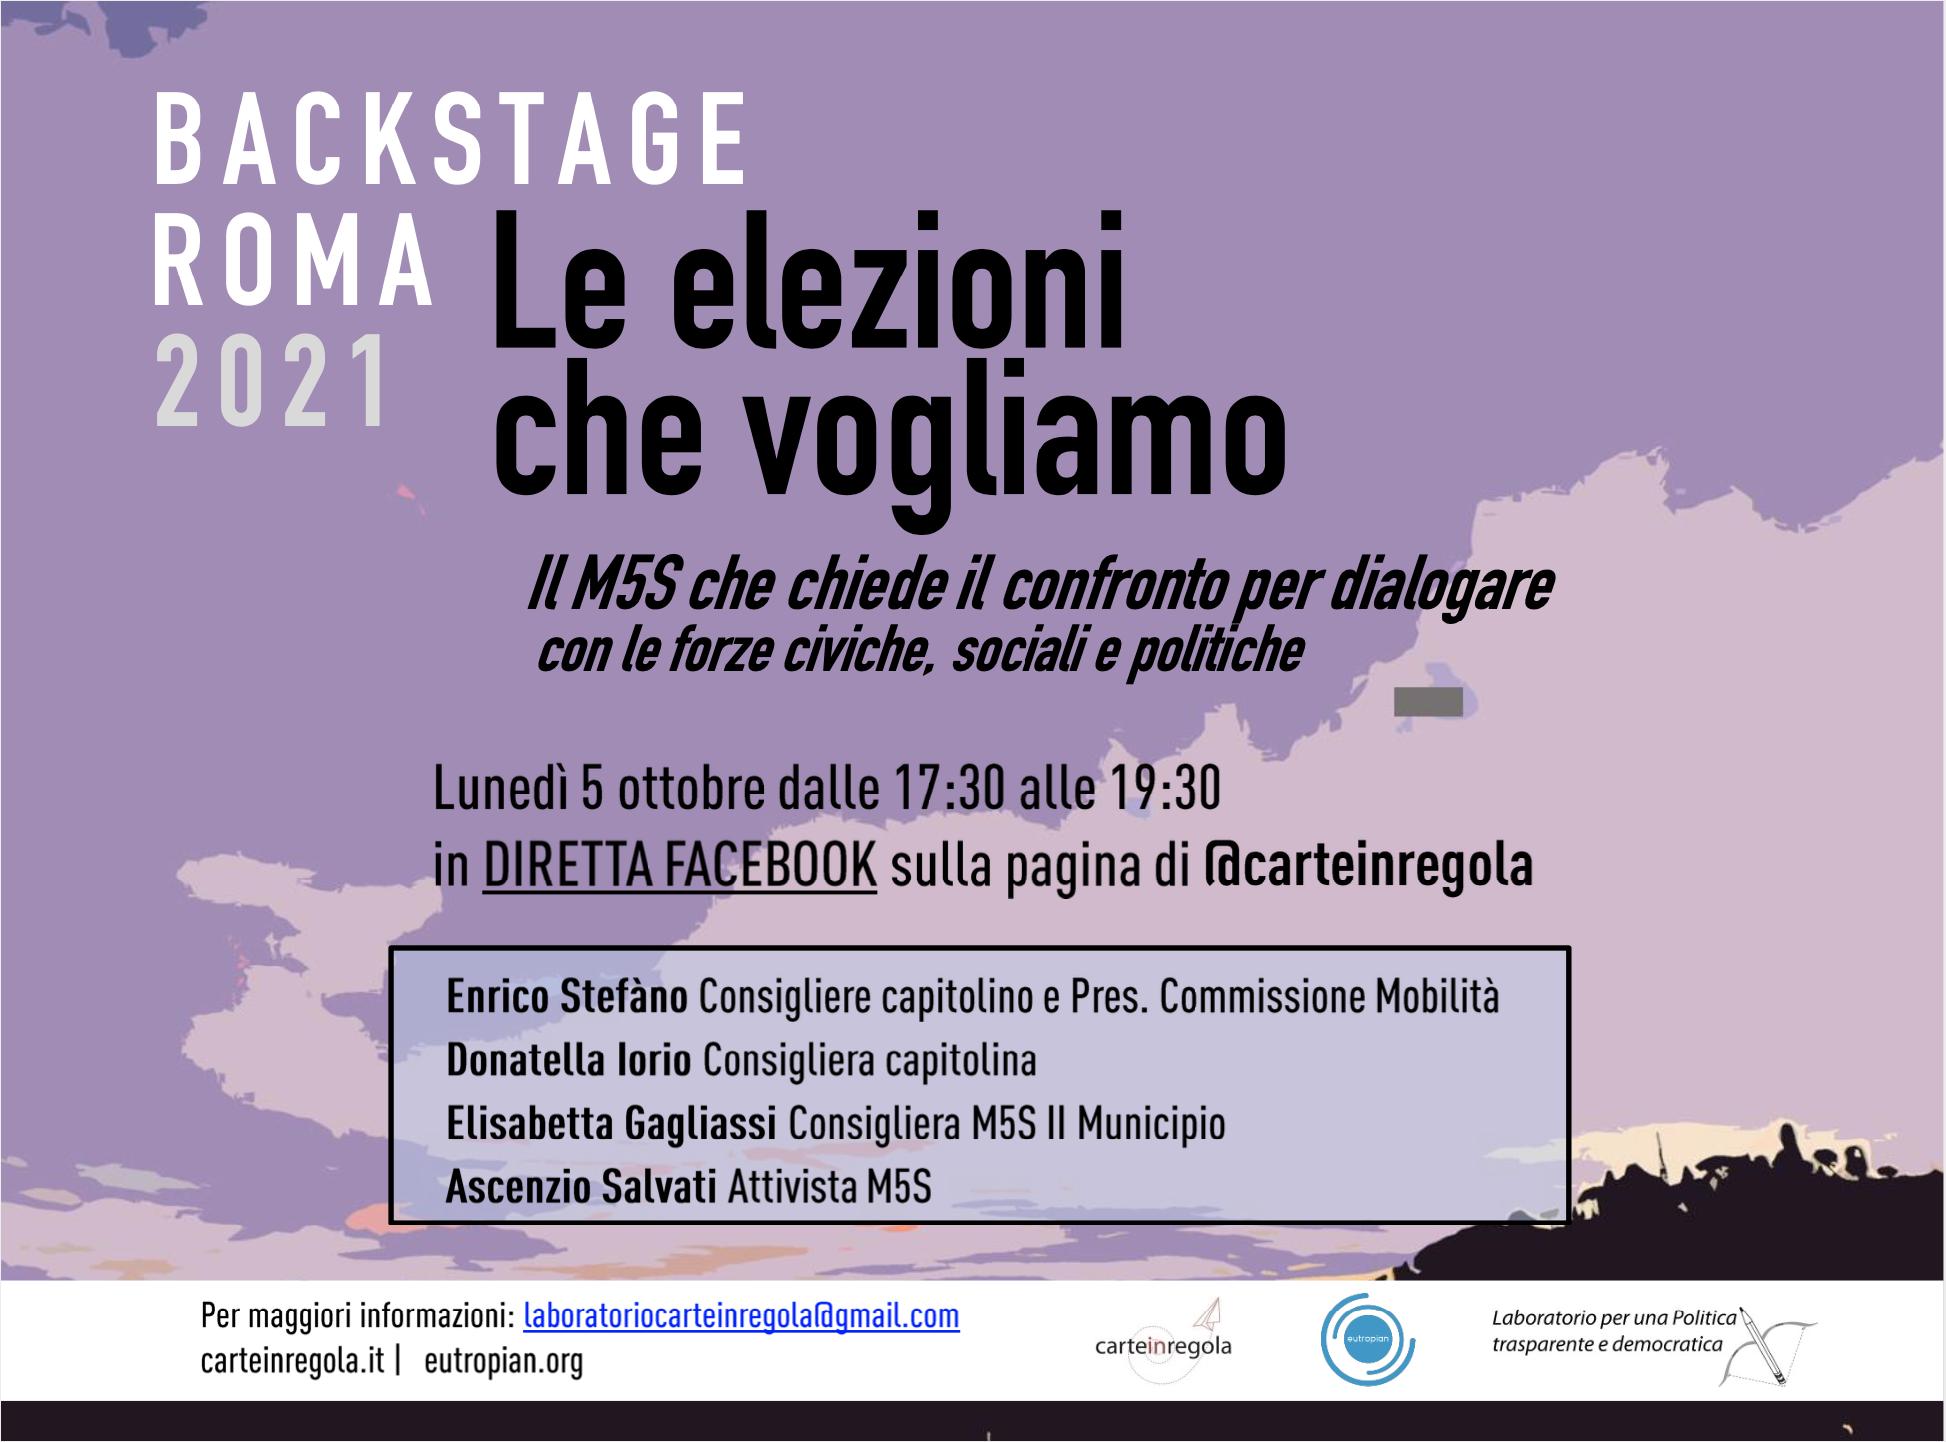 BACK STAGE ROMA 2021 - 5 ottobre